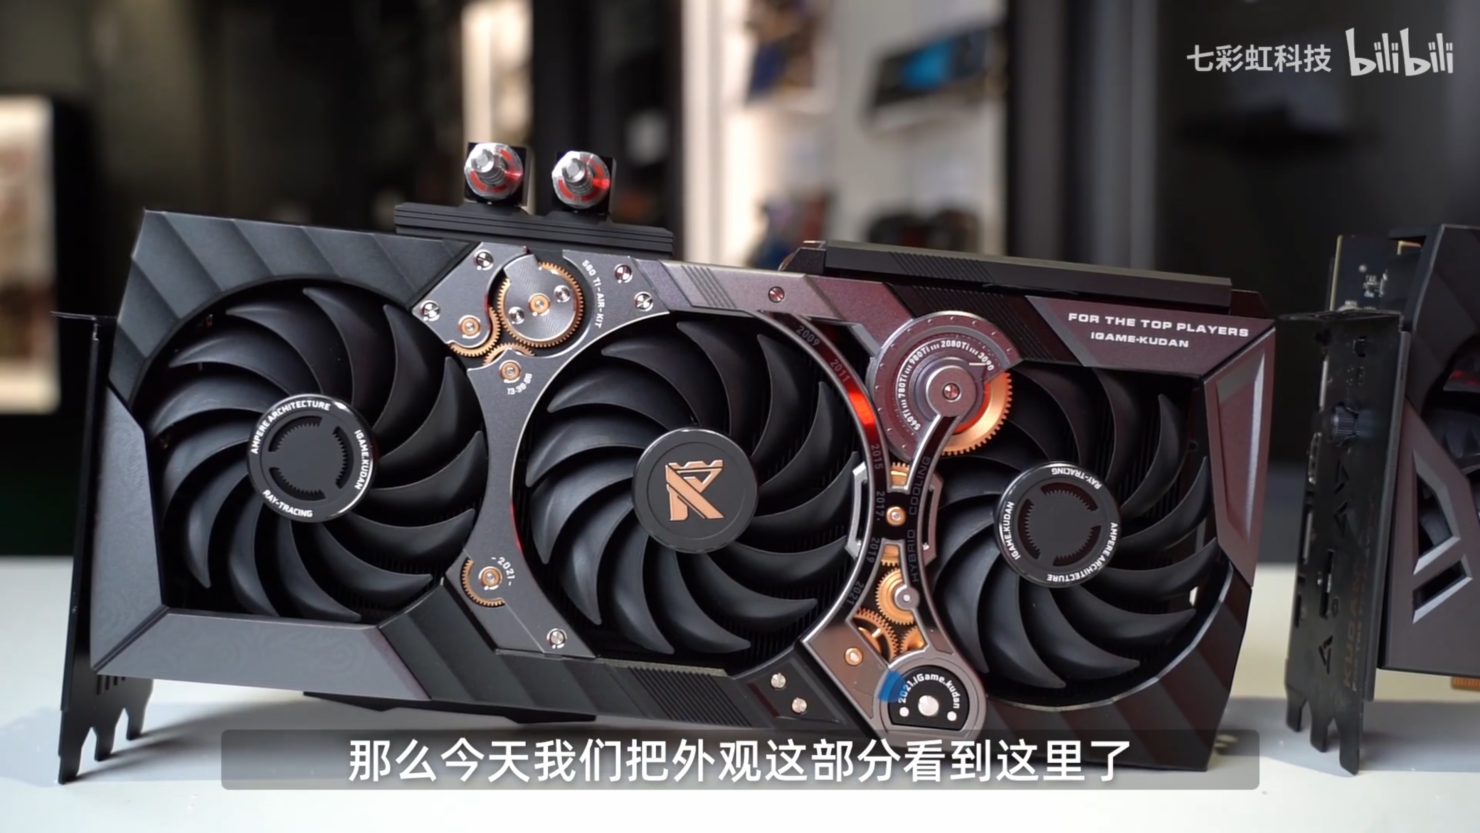 colorful-geforce-rtx-3090-igame-kudan-graphics-card-_16